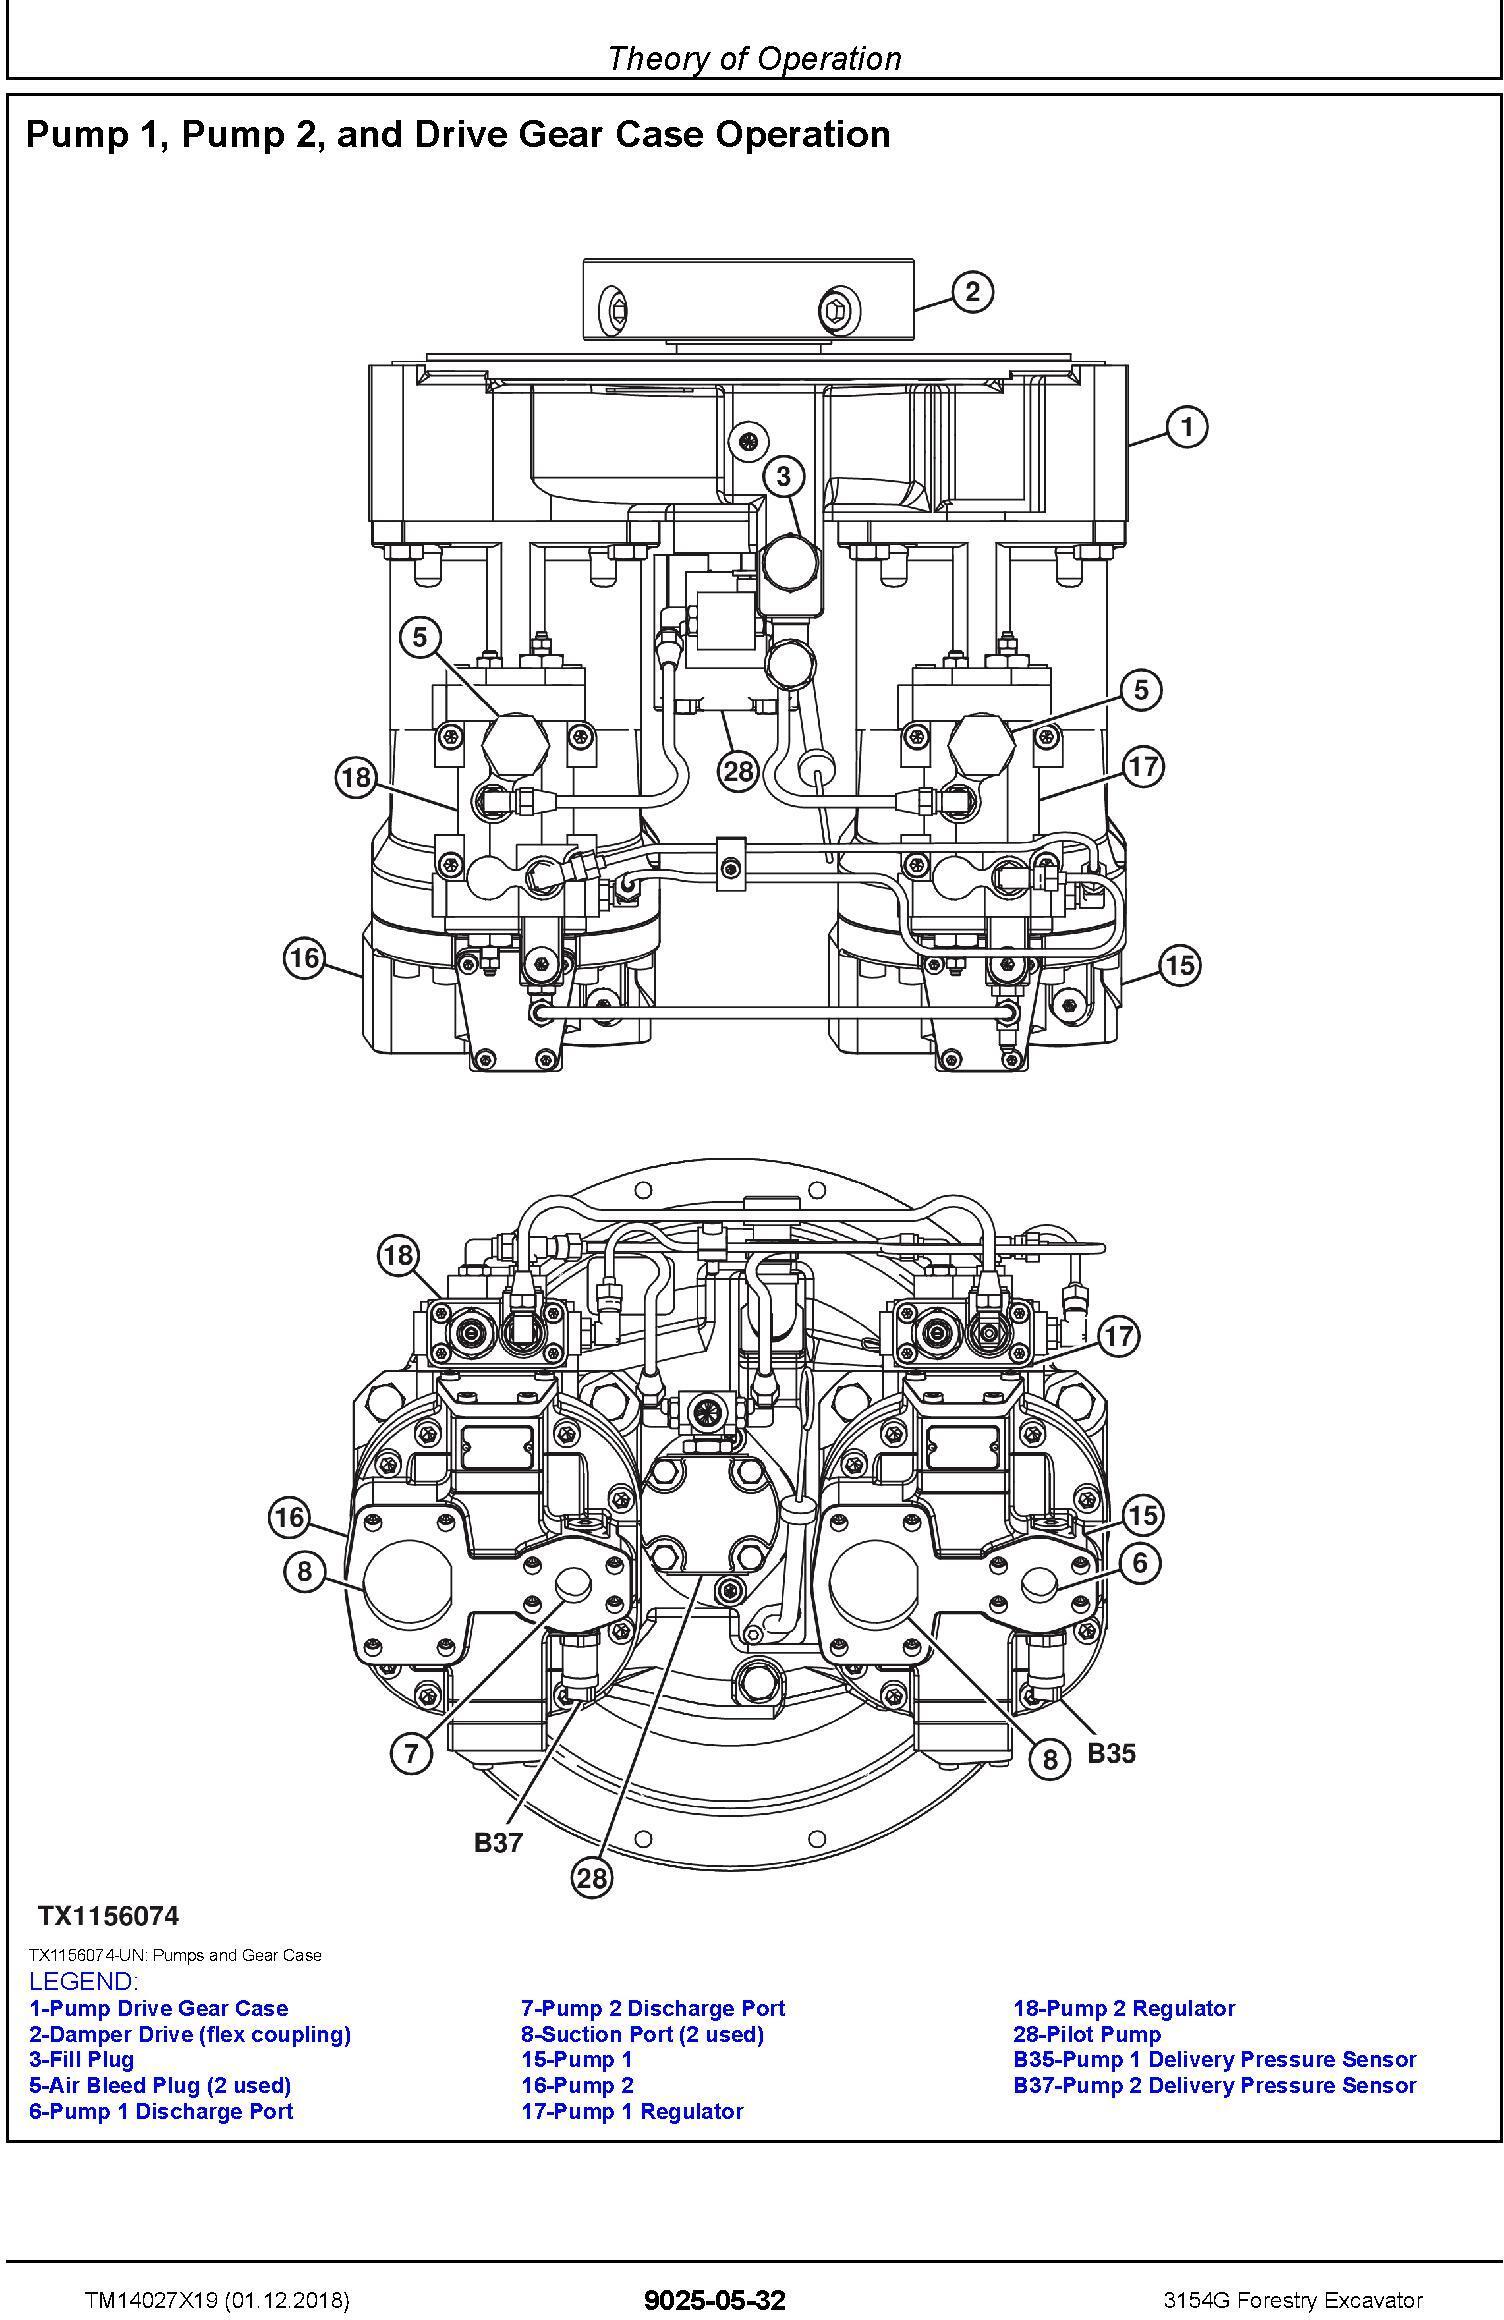 John Deere 3154G (SN. D310001-) Forestry Excavator Operation & Test Technical Manual (TM14027X19) - 3